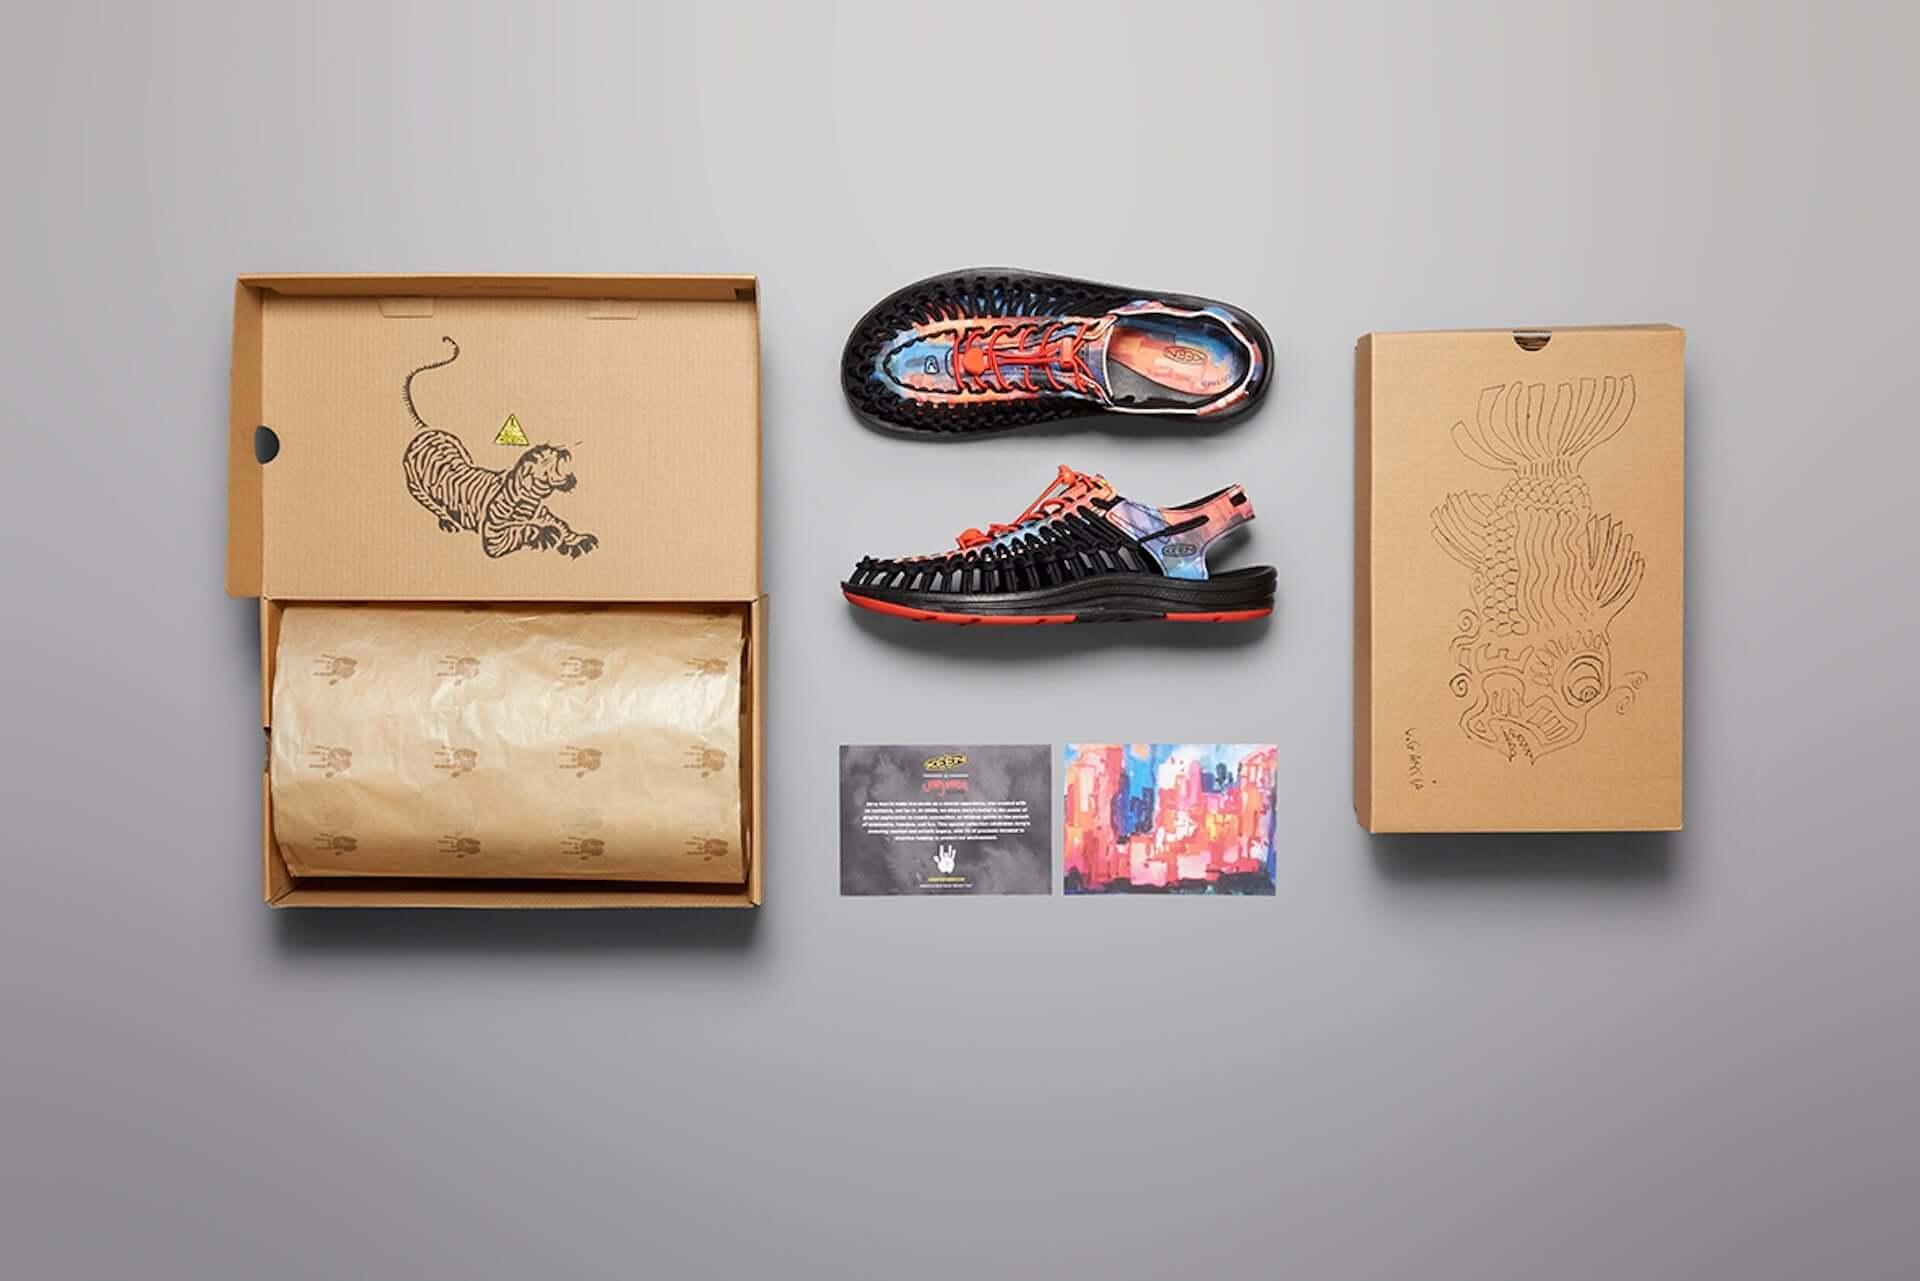 KEENが世界的アーティスト、ジェリー・ガルシアとのコラボアイテムを発売決定!アートワーク2作品をモチーフにしたシューズが登場 lf200730_keen-jerrygarcia_12-1920x1281